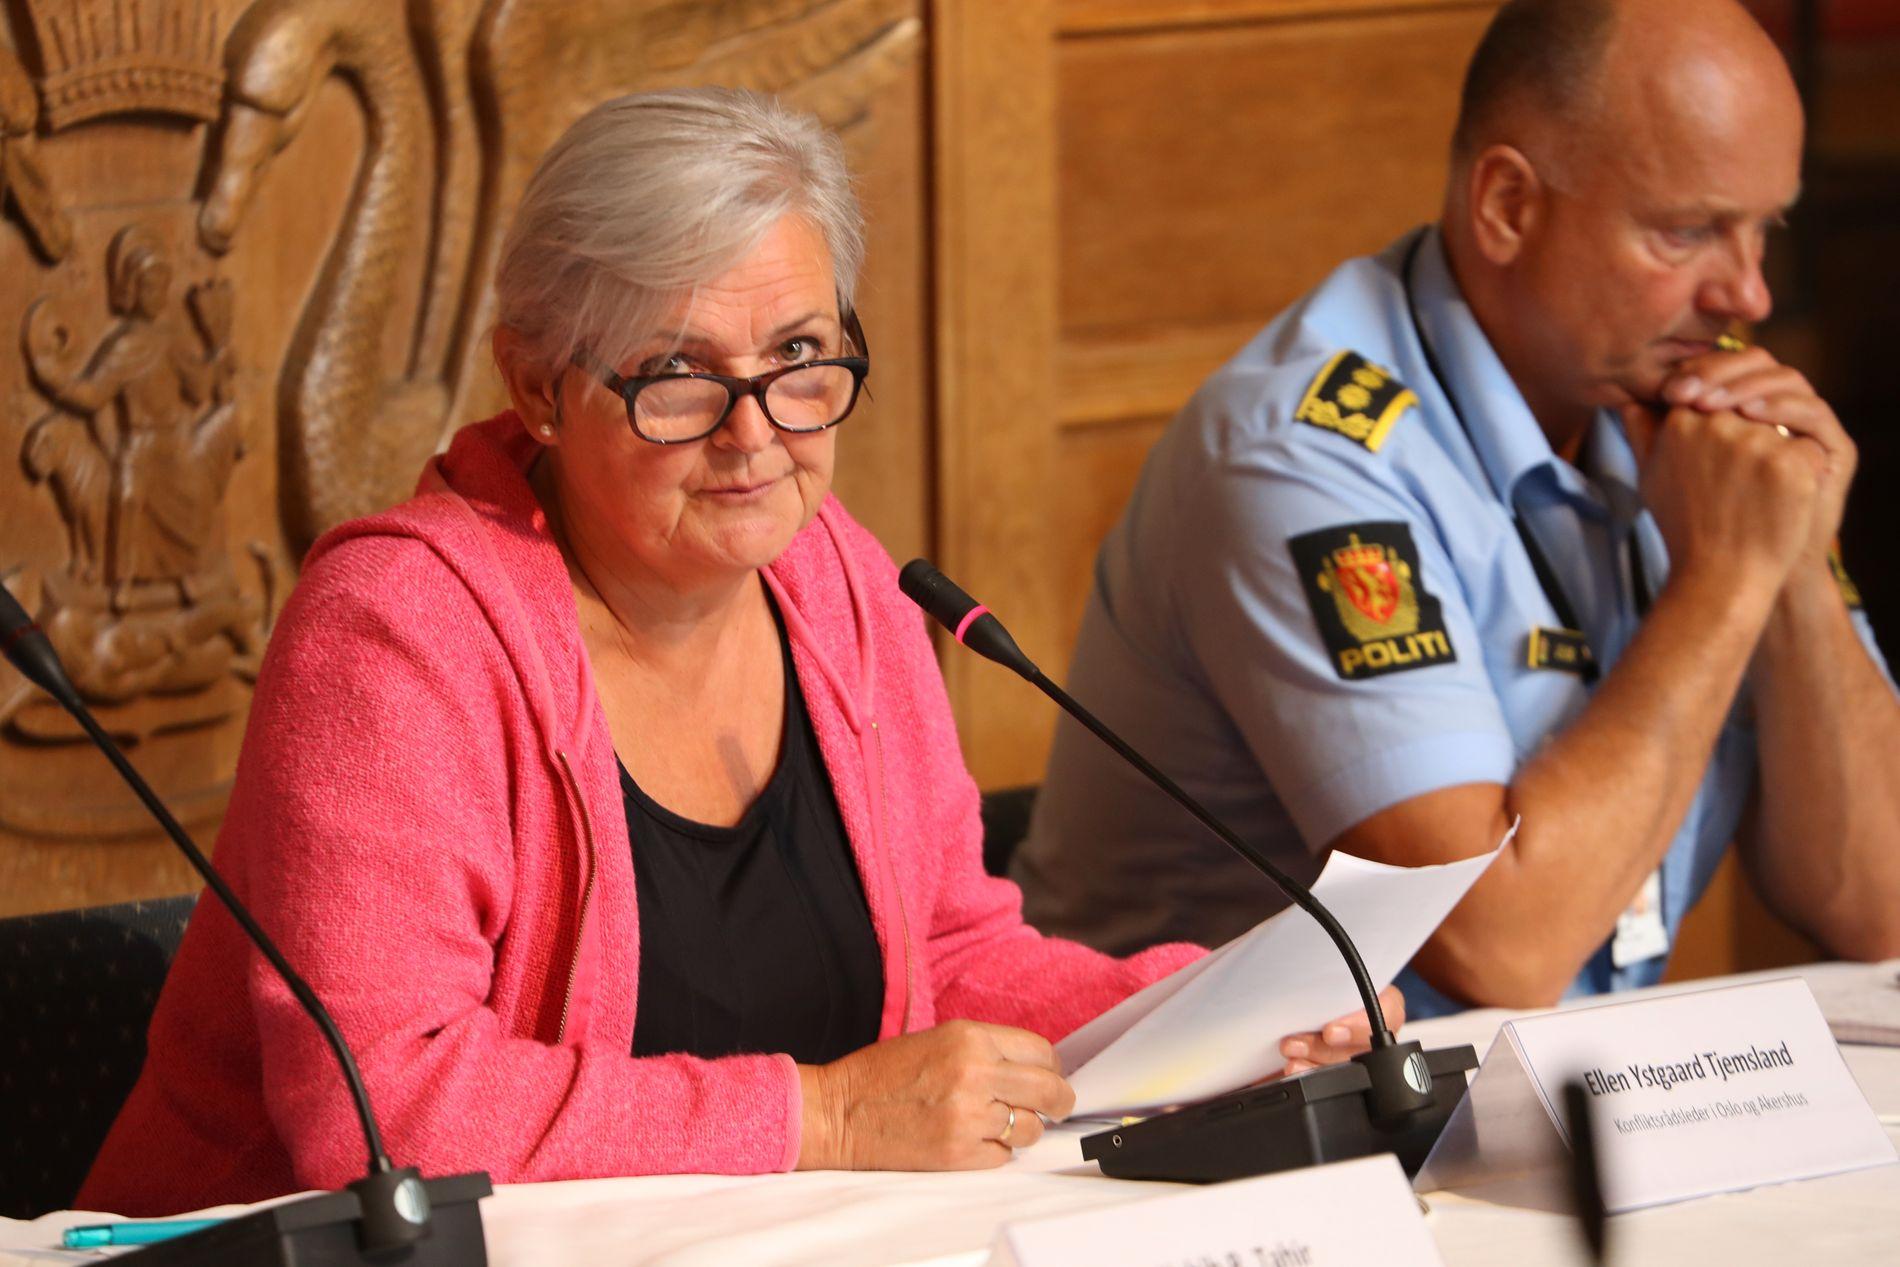 MINDREÅRIGE. Én av tre fullfører ikke oppfølgingen Konfliktrådet tilbyr unge lovbrytere mellom 15 og 18 år. Leder av Konfliktrådet Ellen Ystgaard Tjemsland delte sine erfaringer under dagens høring om ungdomskriminalitet i Oslo bystyre.